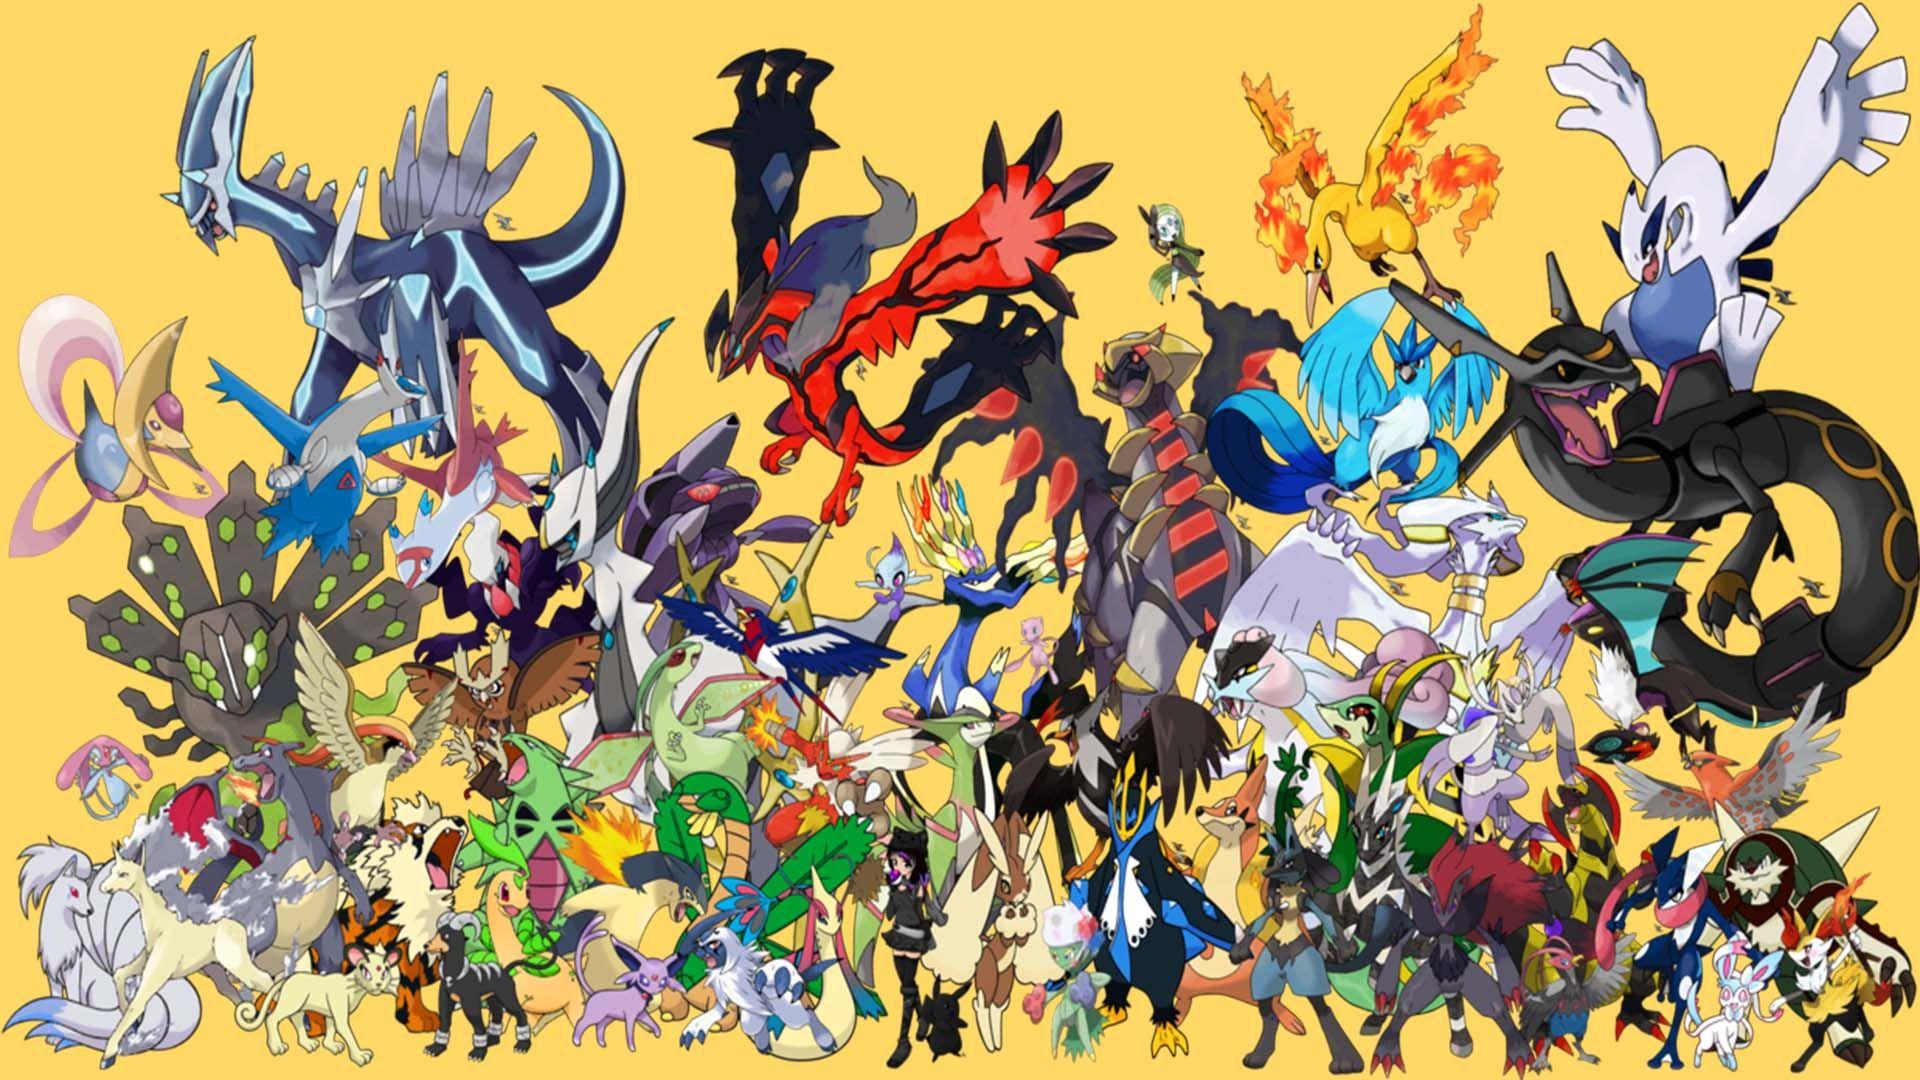 Pictures Of The Legendary Pokemon